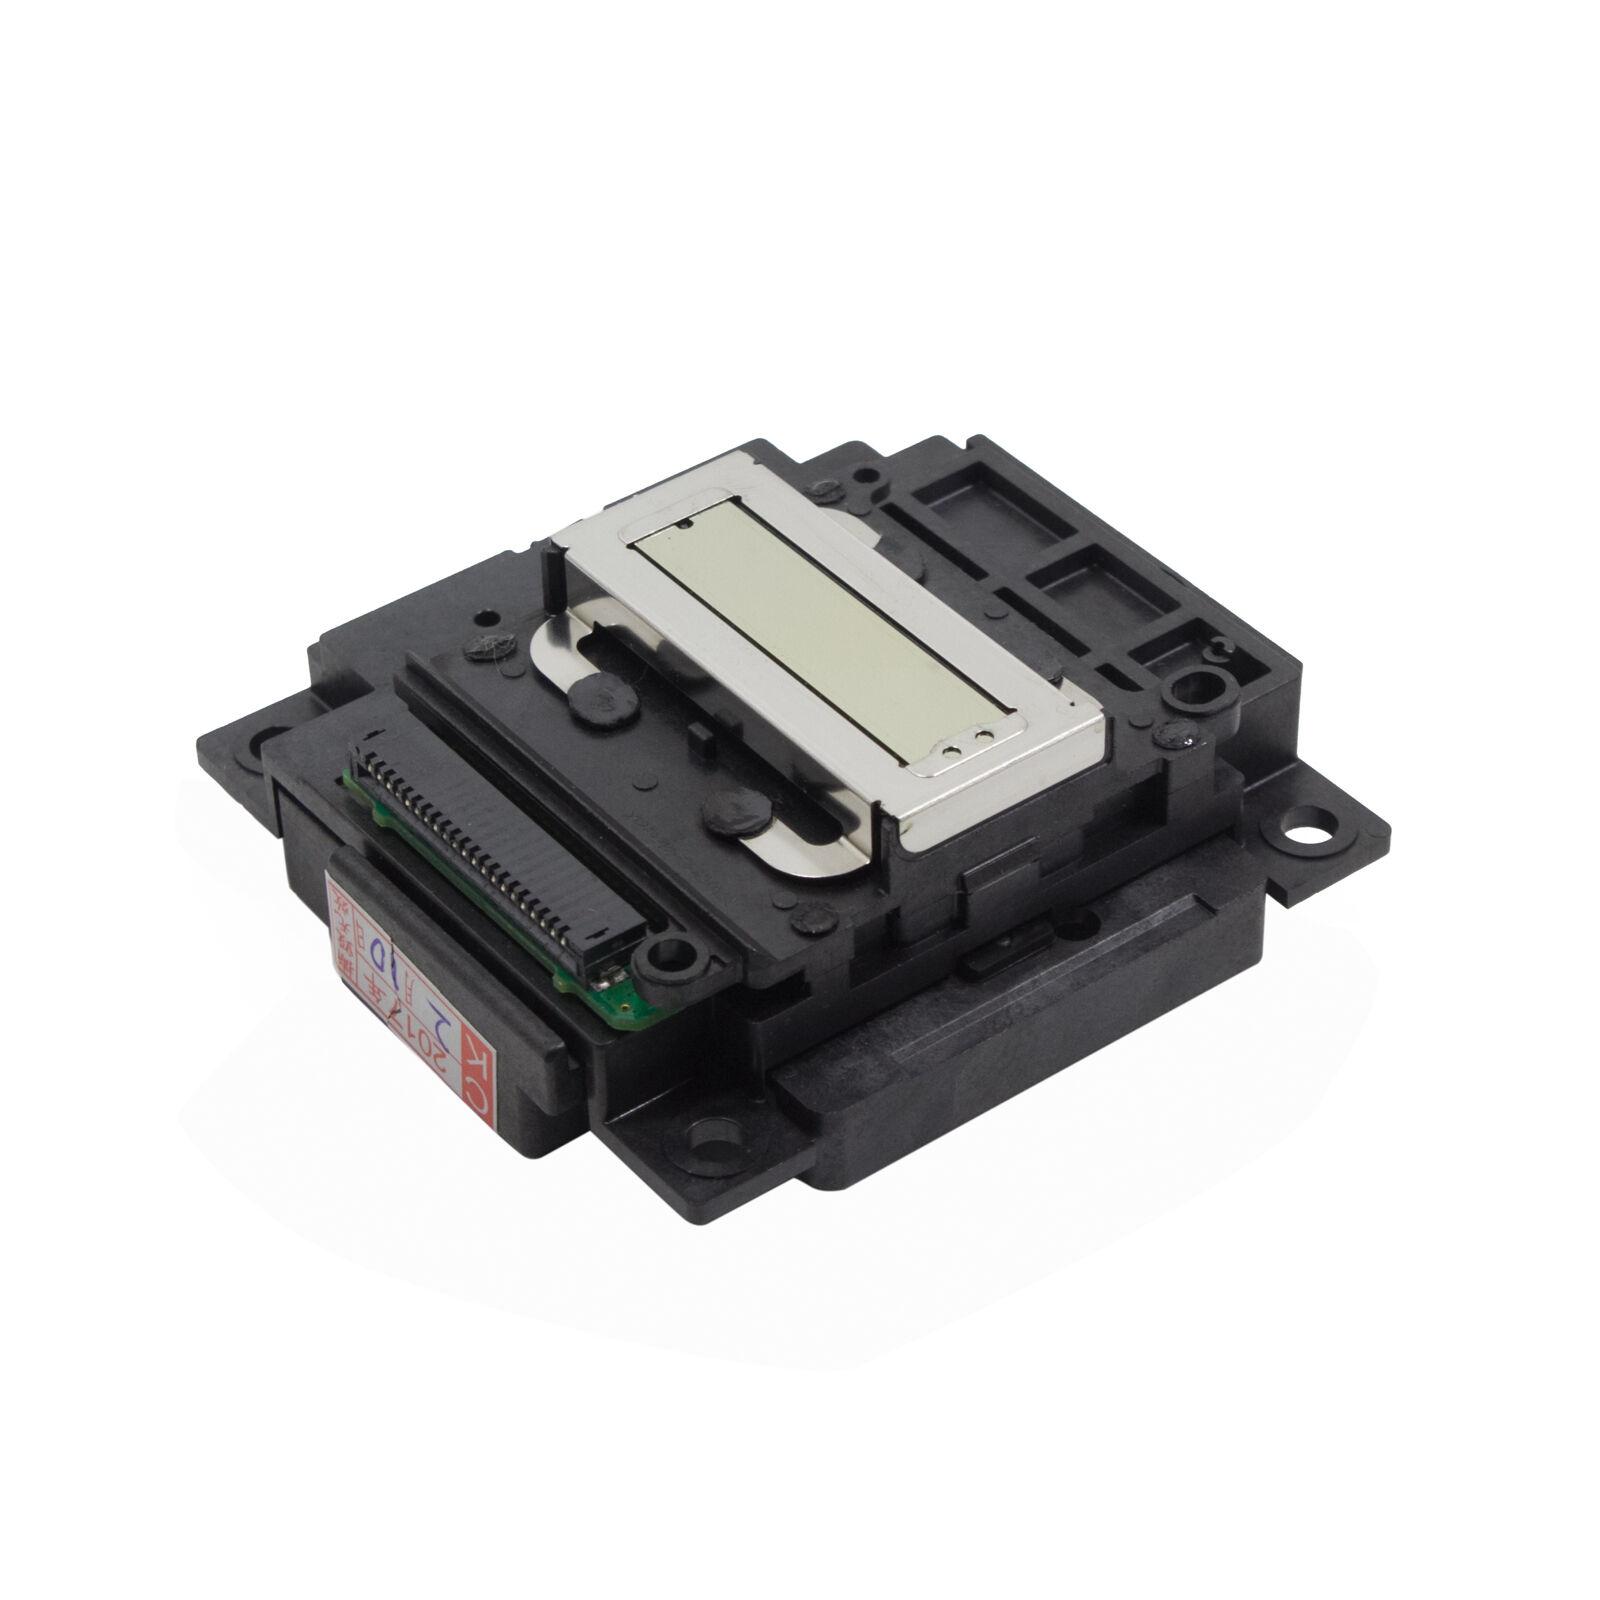 REFIT F181010 Printhead Print Head for Epson ME360 ME510 L101 L201 L100 ME32 C90 T11 T13 T20E L200 ME340 TX100 TX101 TX105 TX110 TX111